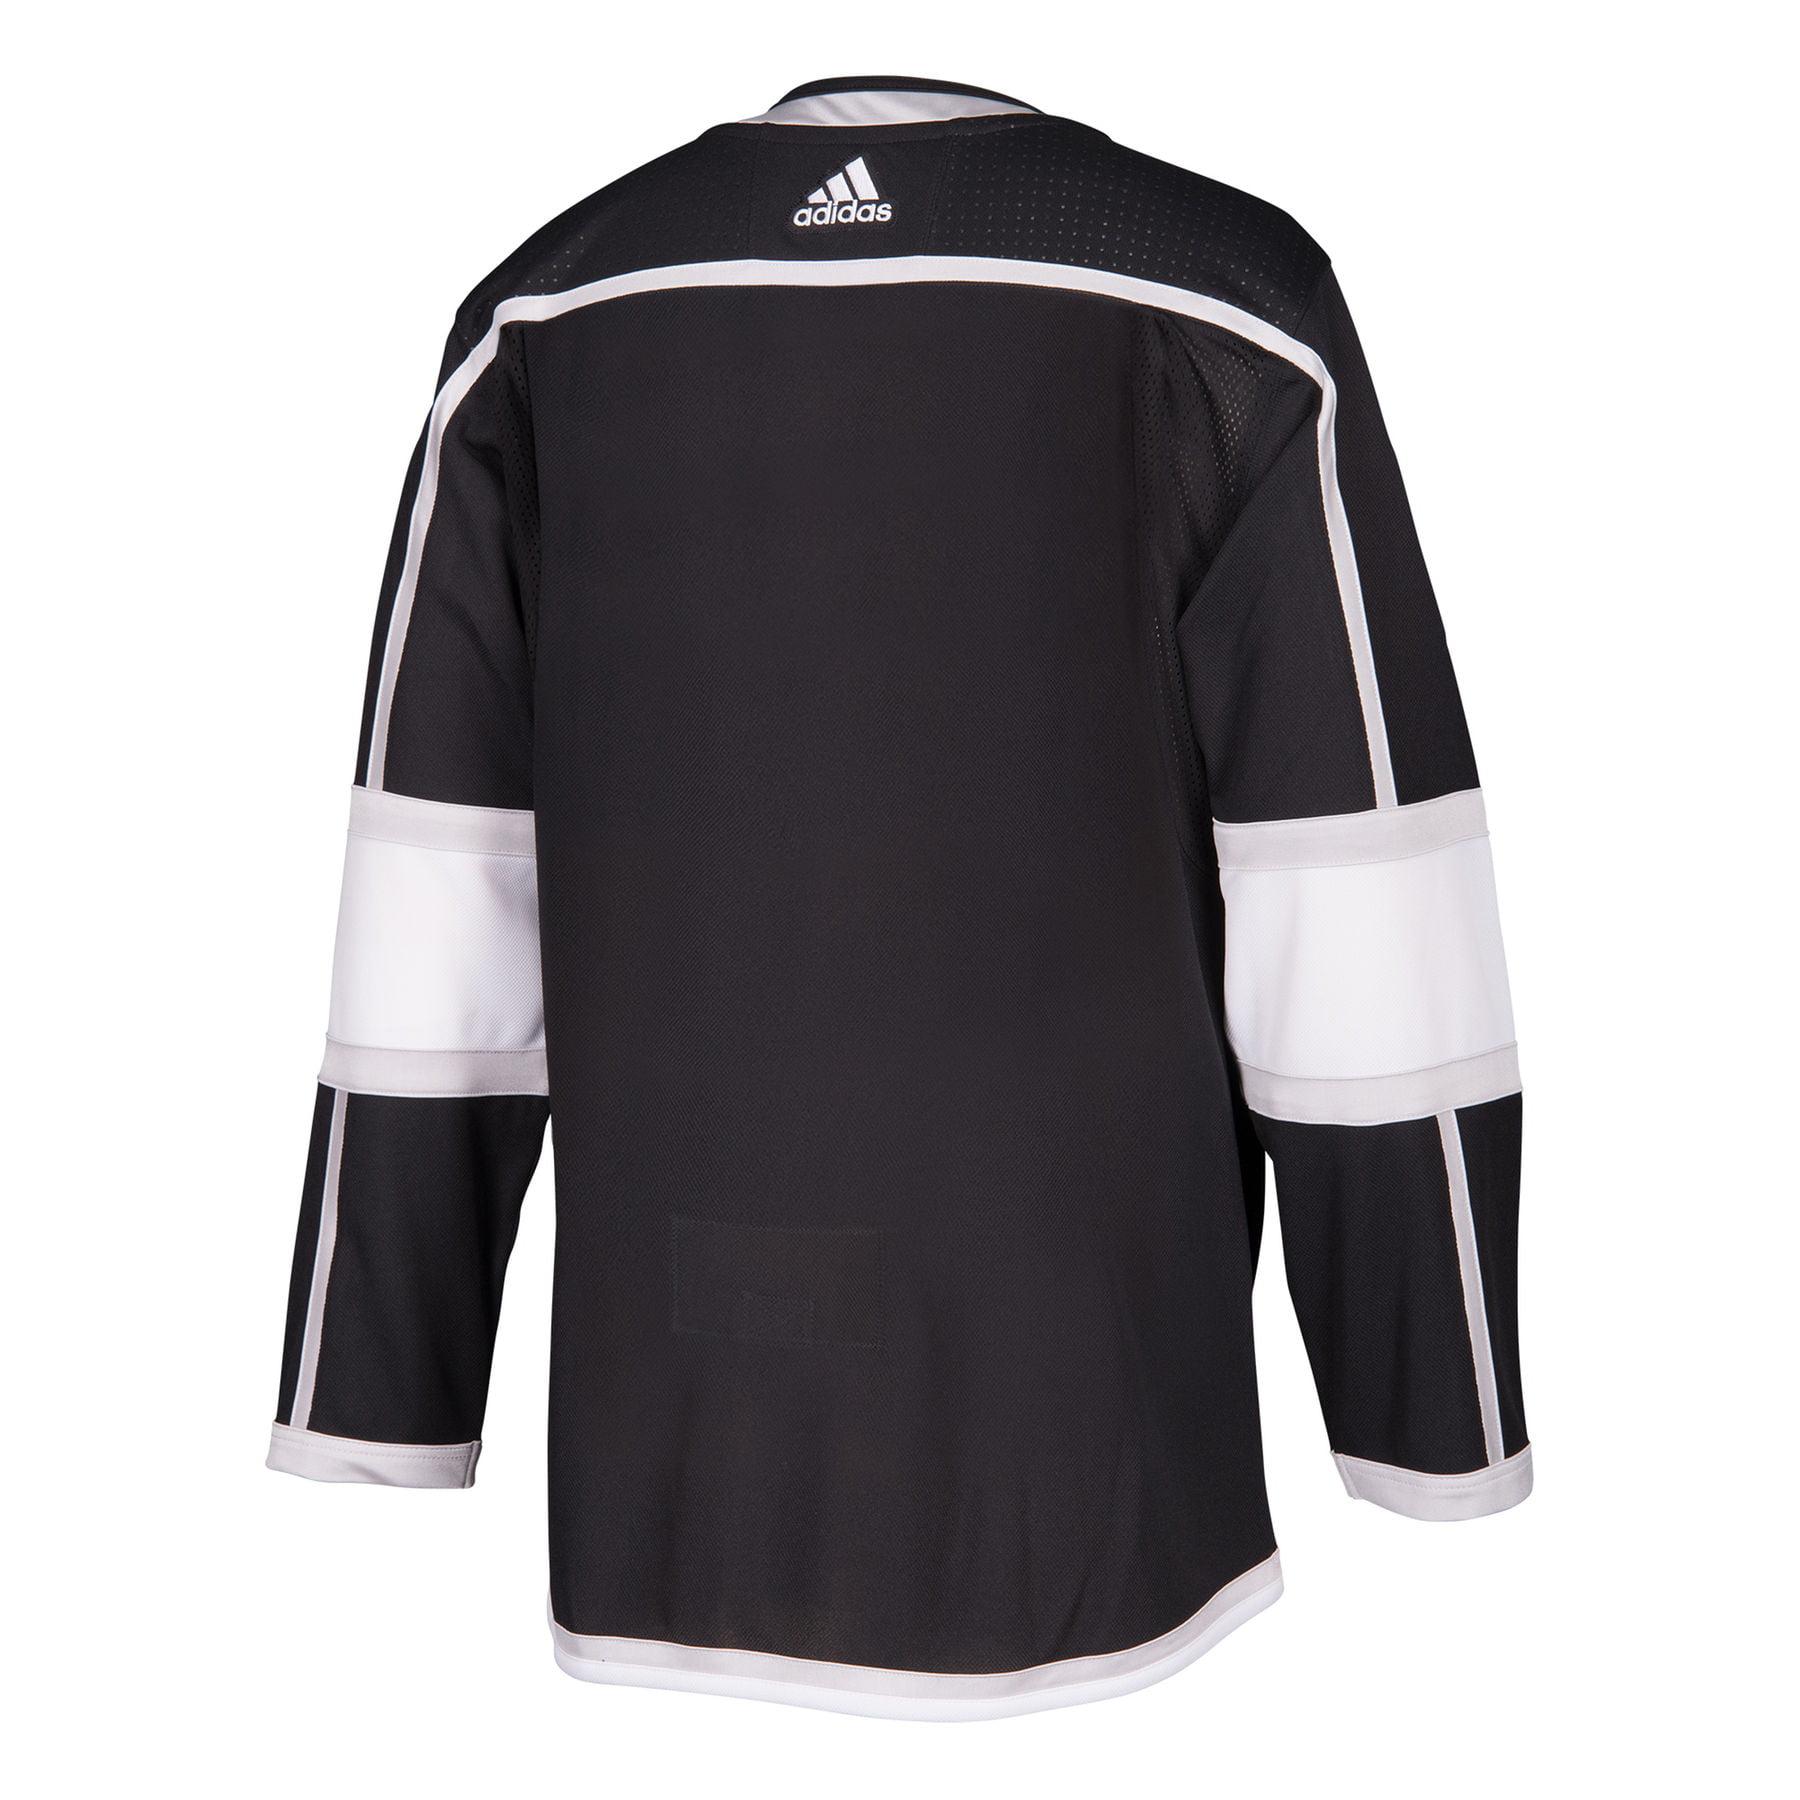 67e09b91d Los Angeles Kings Adidas Adizero NHL Authentic Pro Home Jersey